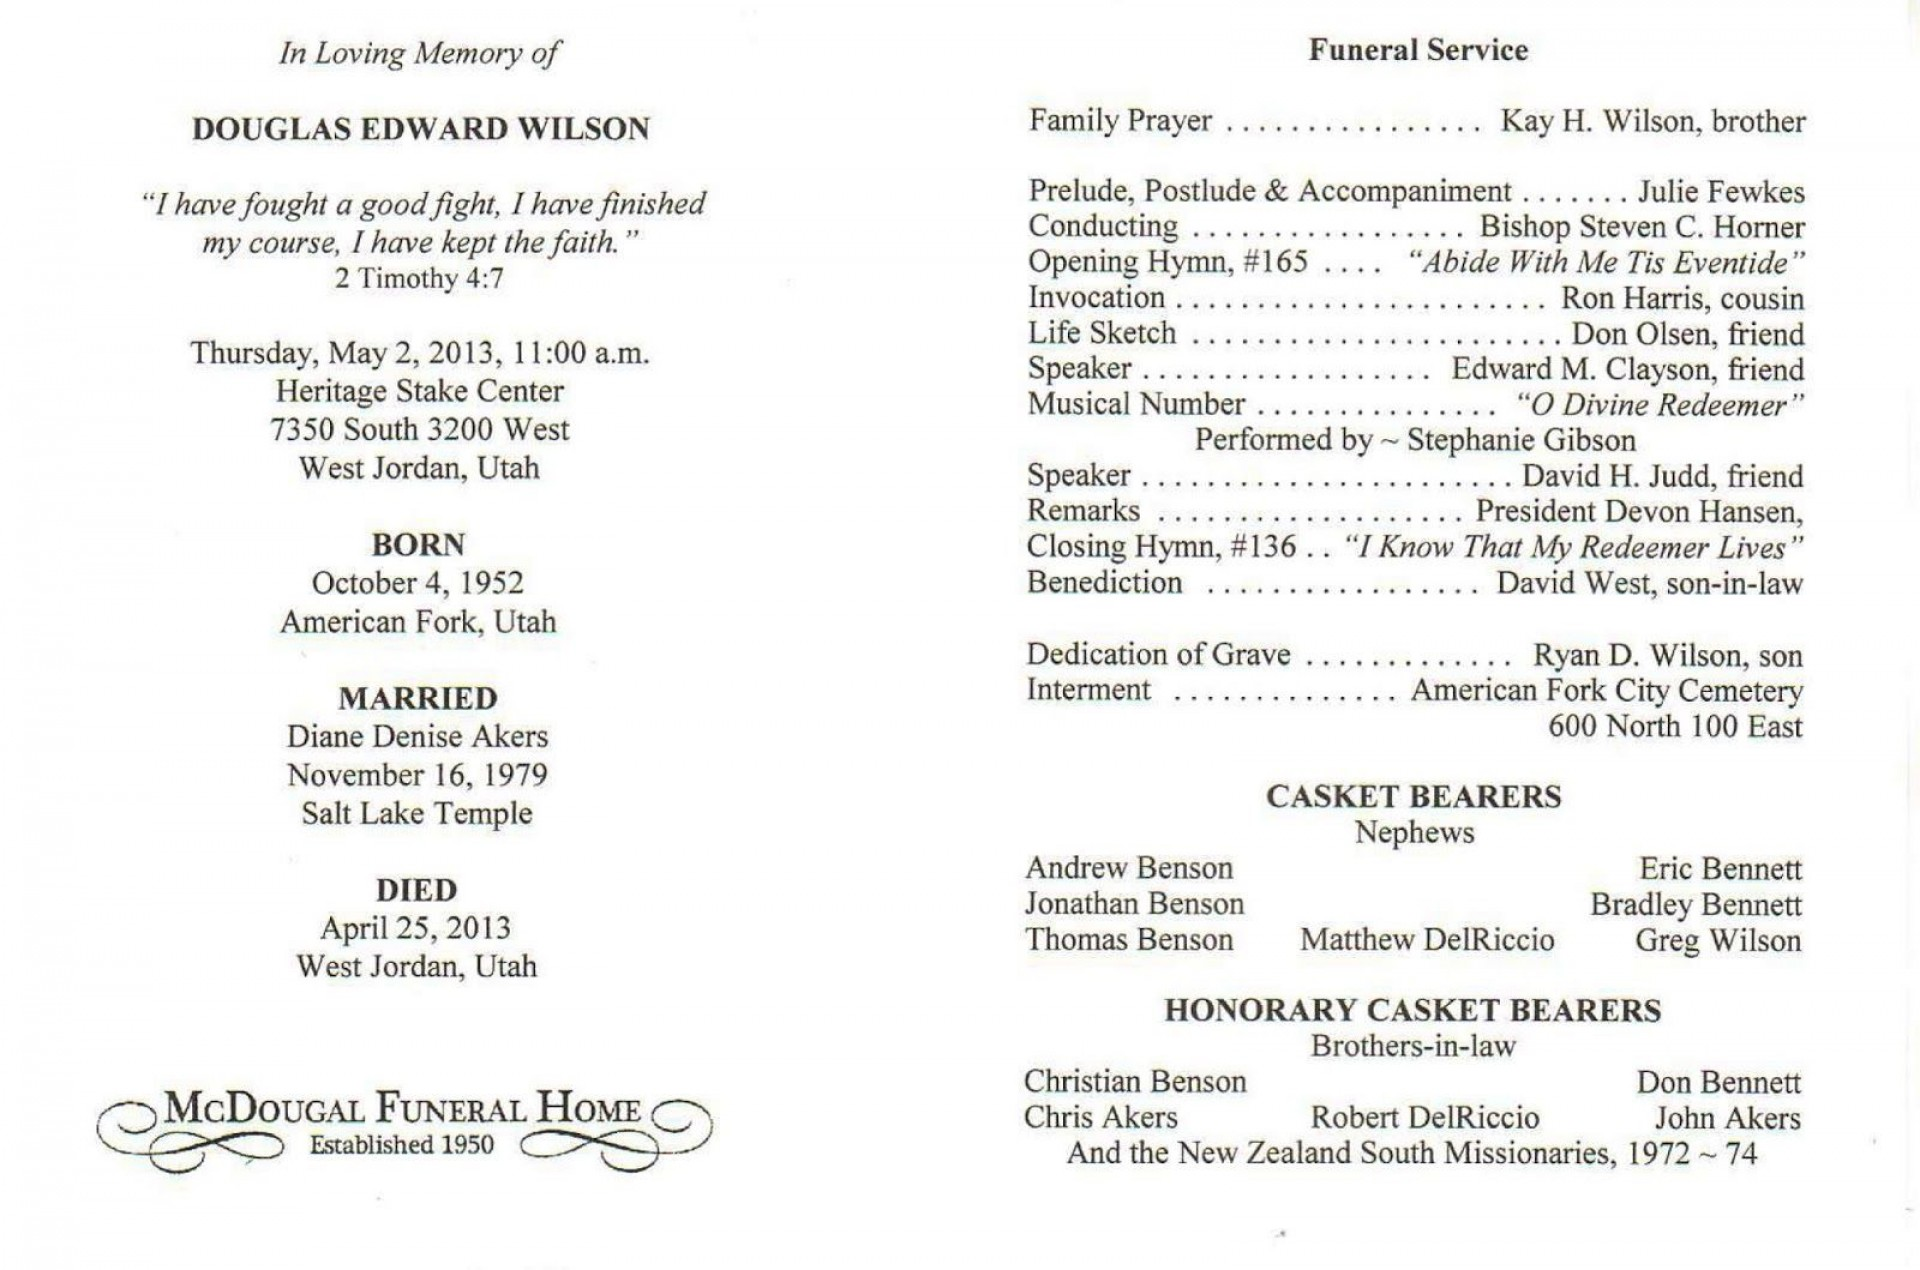 002 Beautiful Catholic Funeral Program Template High Def  Mas Layout Free1920